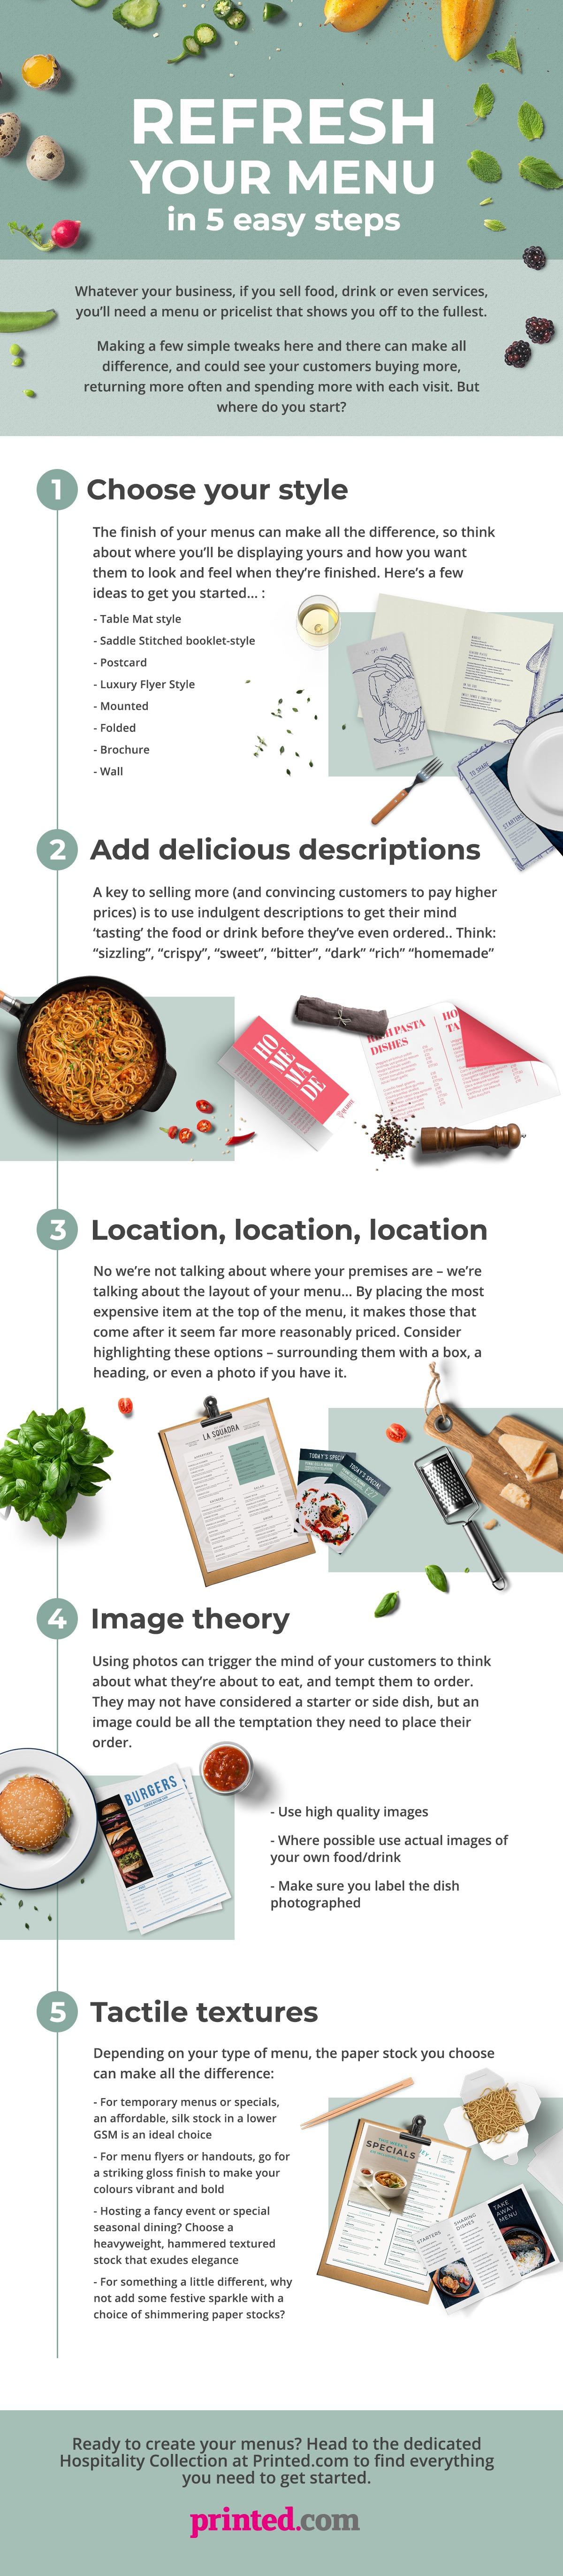 print menus in 5 steps - 5 tips for menu printing - menu trends and advice